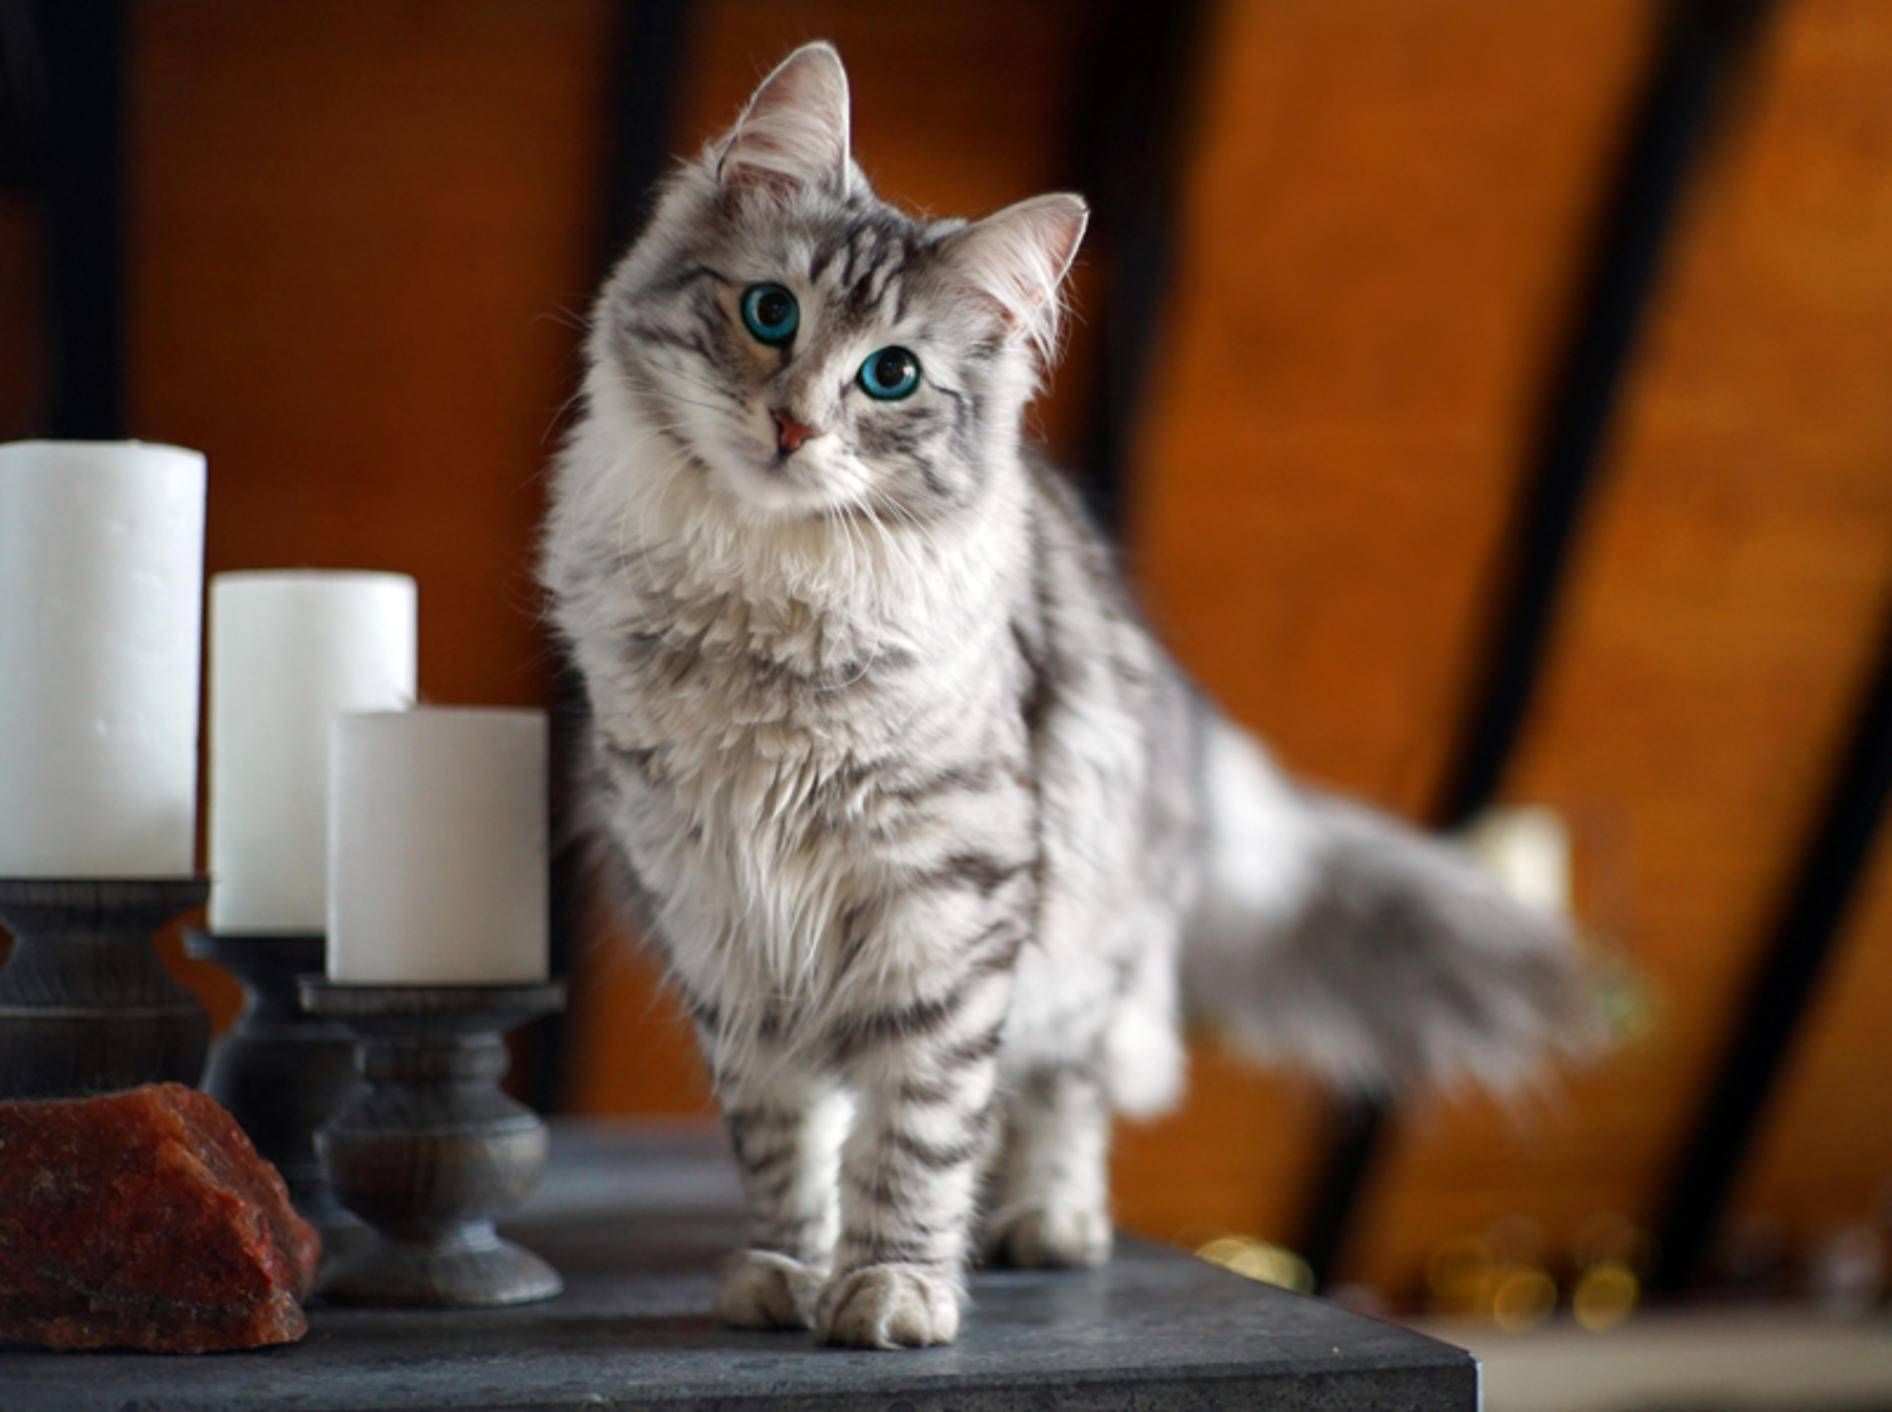 """Nanu? Was ist denn das?"", wundert sich diese neugierige Katze. Ob sie wohl die Kamera meint? – Shutterstock / www.julian.pictures"